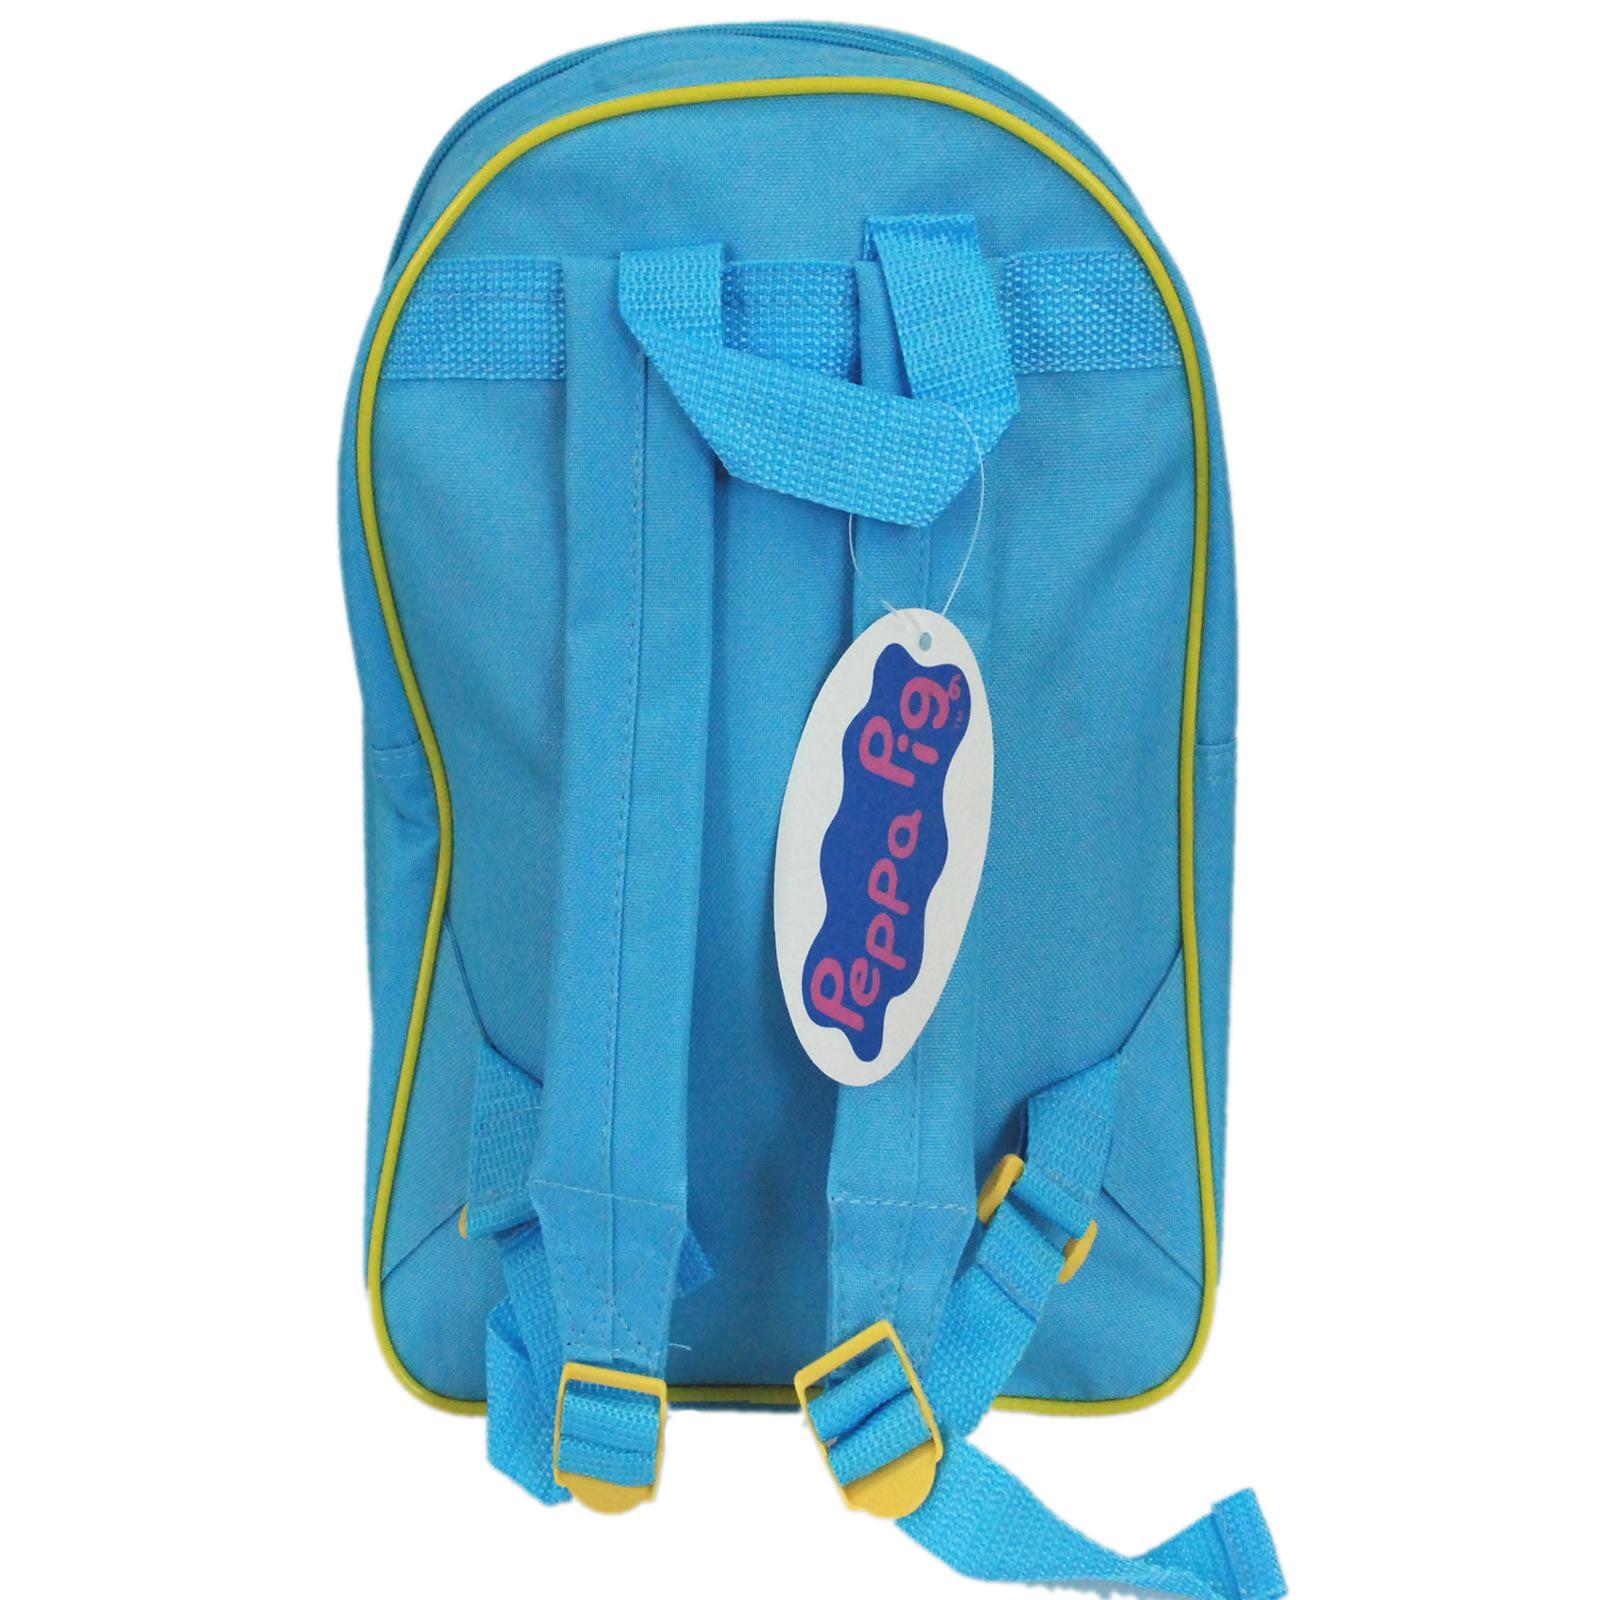 695cba271d Peppa Pig Characters Girls   Boys Backpacks School Bags   Sports Bag ...